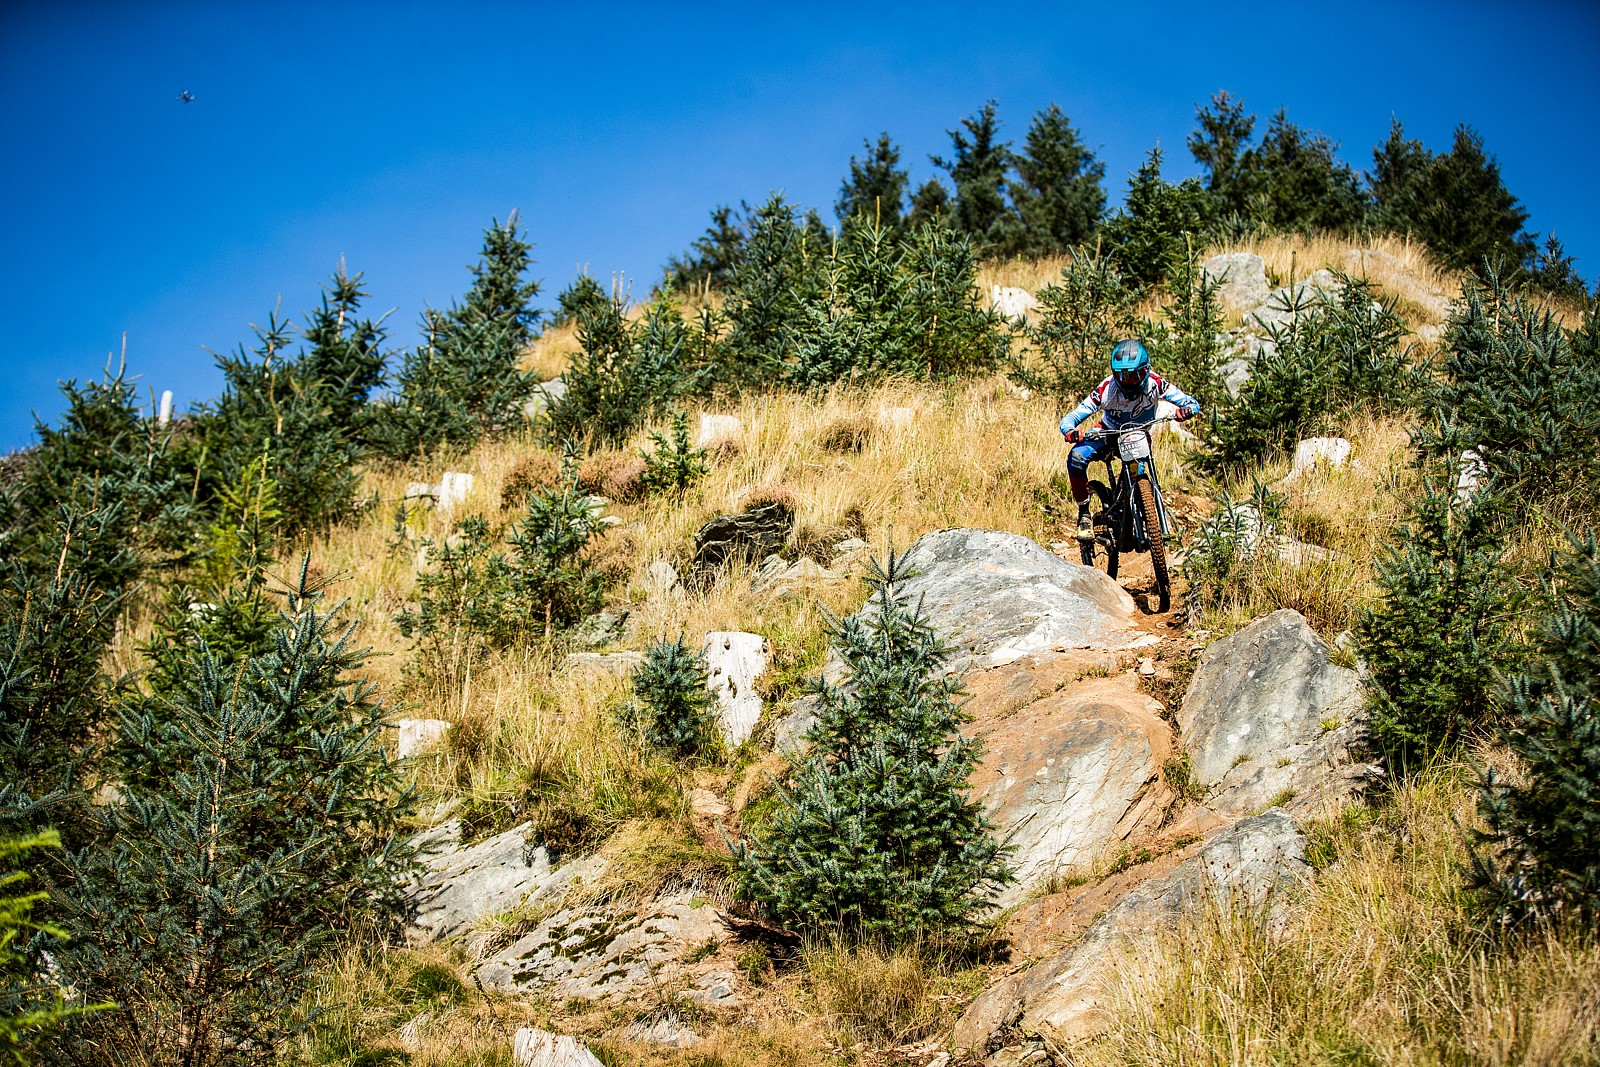 Alexandre Fayolle - Red Bull Hardline in Photos - Mountain Biking Pictures - Vital MTB